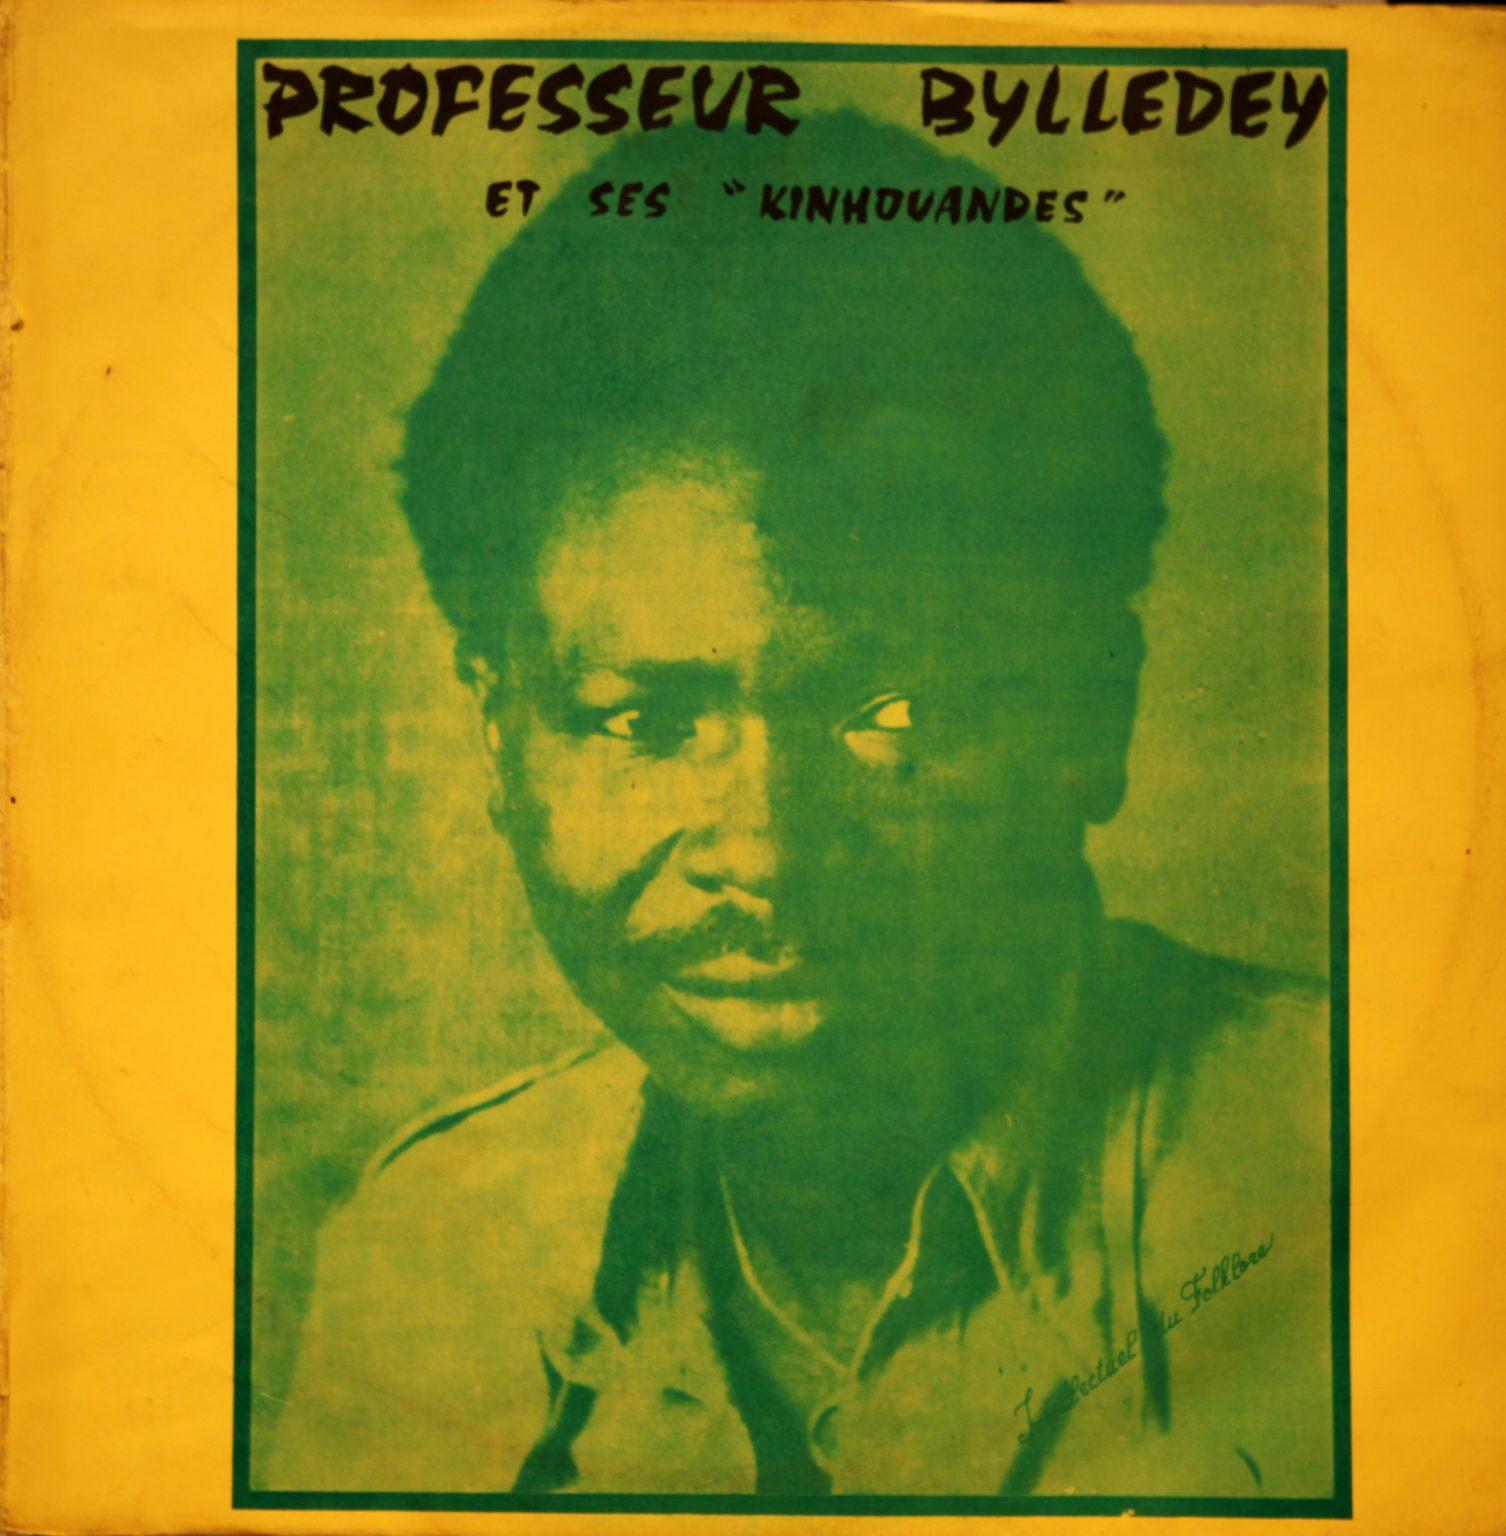 Professeur Bylledey Guissey – Offensive Culturelle, Vol. 2 80s BENIN Highlife Music ALBUM